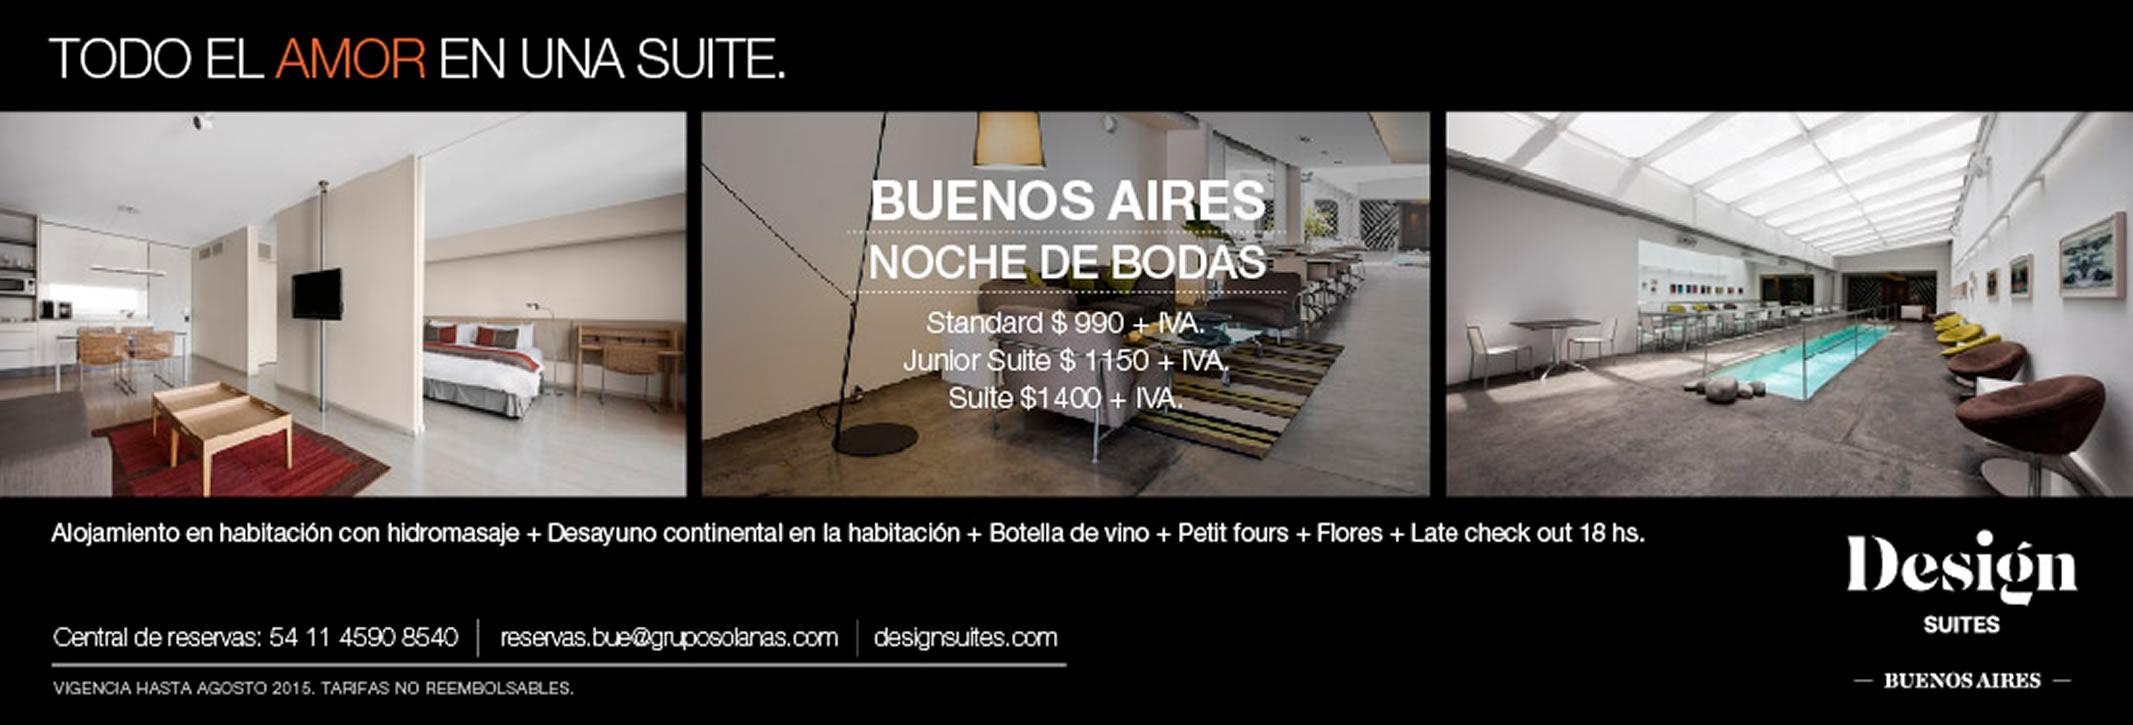 Promociones design suites hoteles de dise o - Hoteles de diseno espana ...